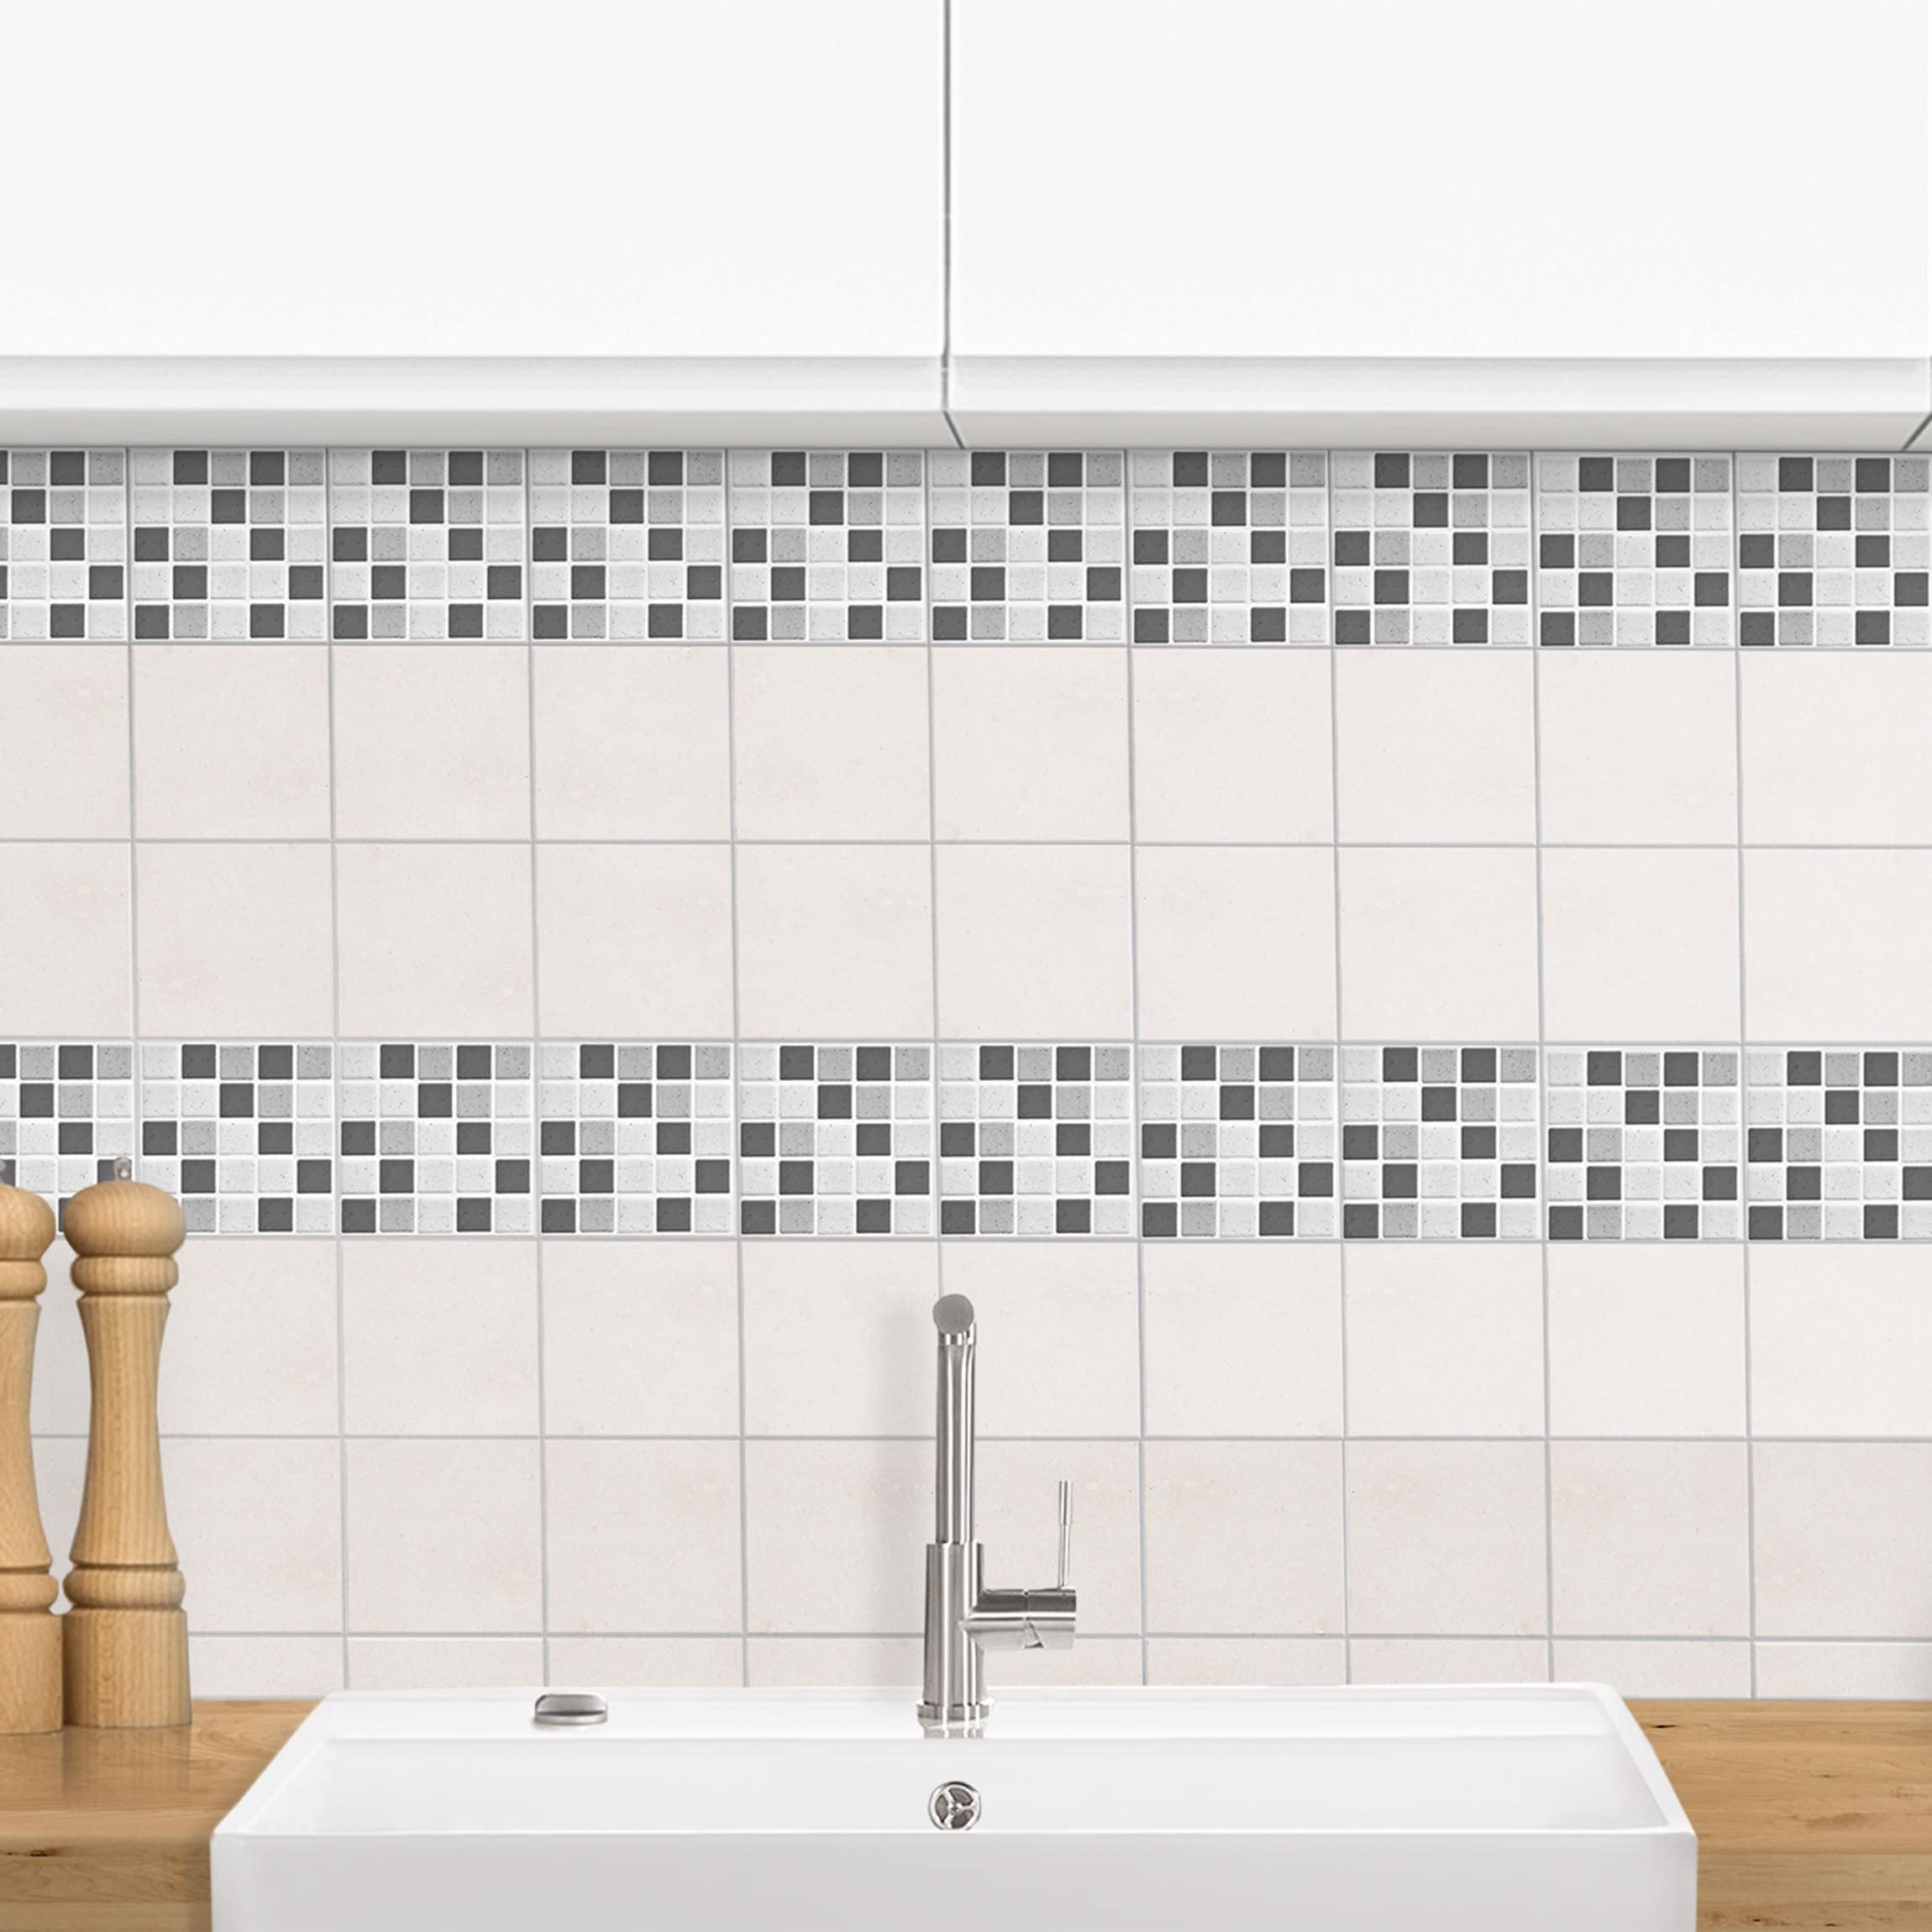 fliesen bord re mosaikfliesen grau 10x10 cm fliesensticker set. Black Bedroom Furniture Sets. Home Design Ideas